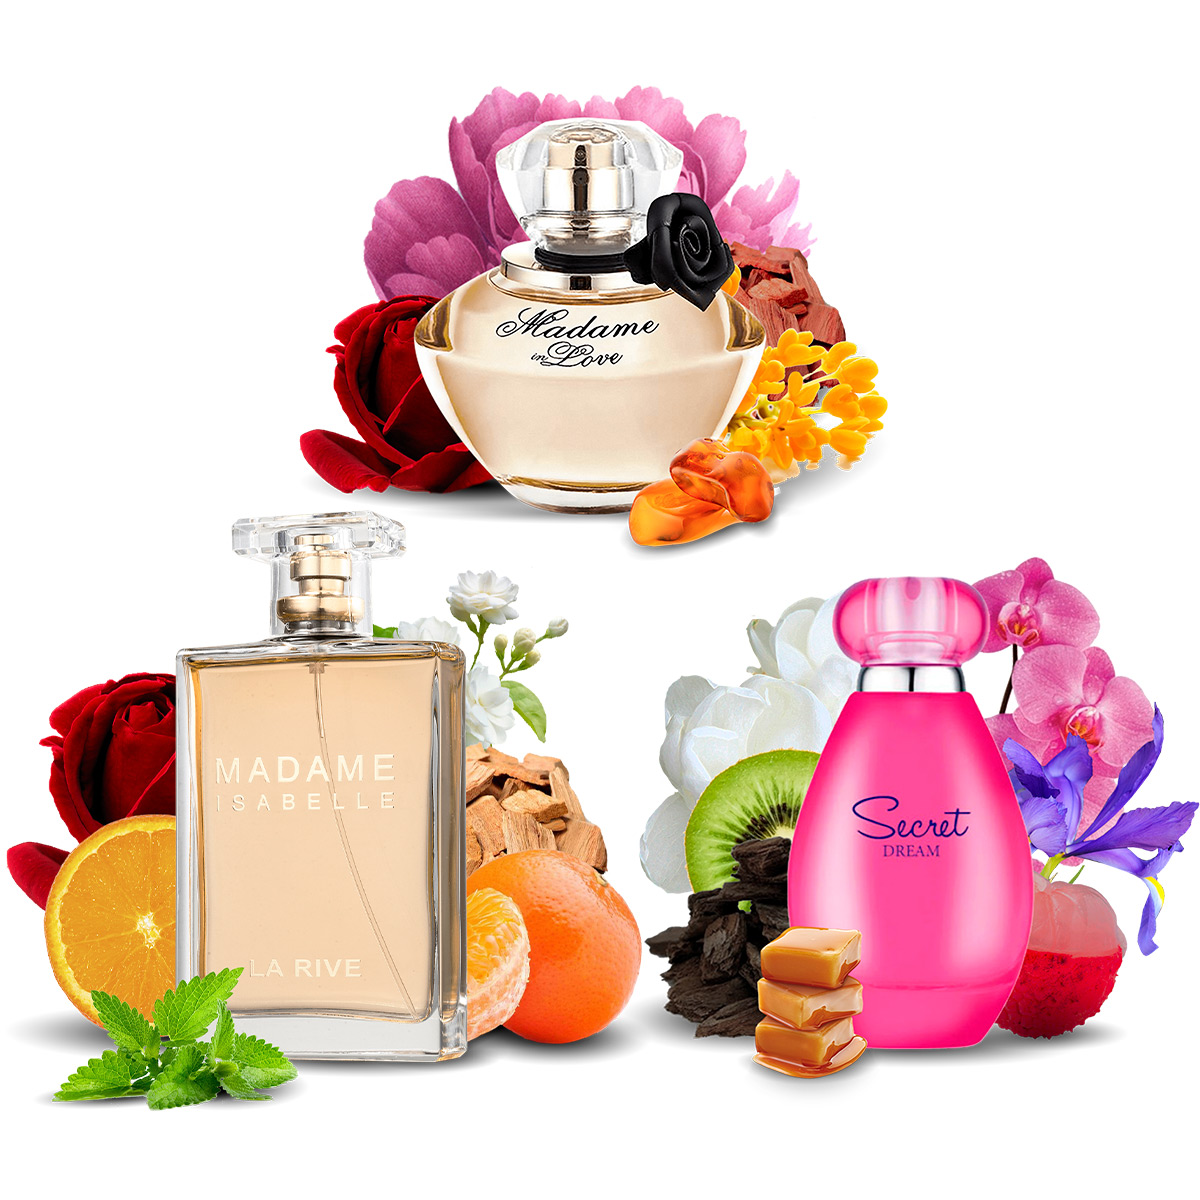 Kit 10 Perfumes Importados La Rive Atacado Mais Vendidos